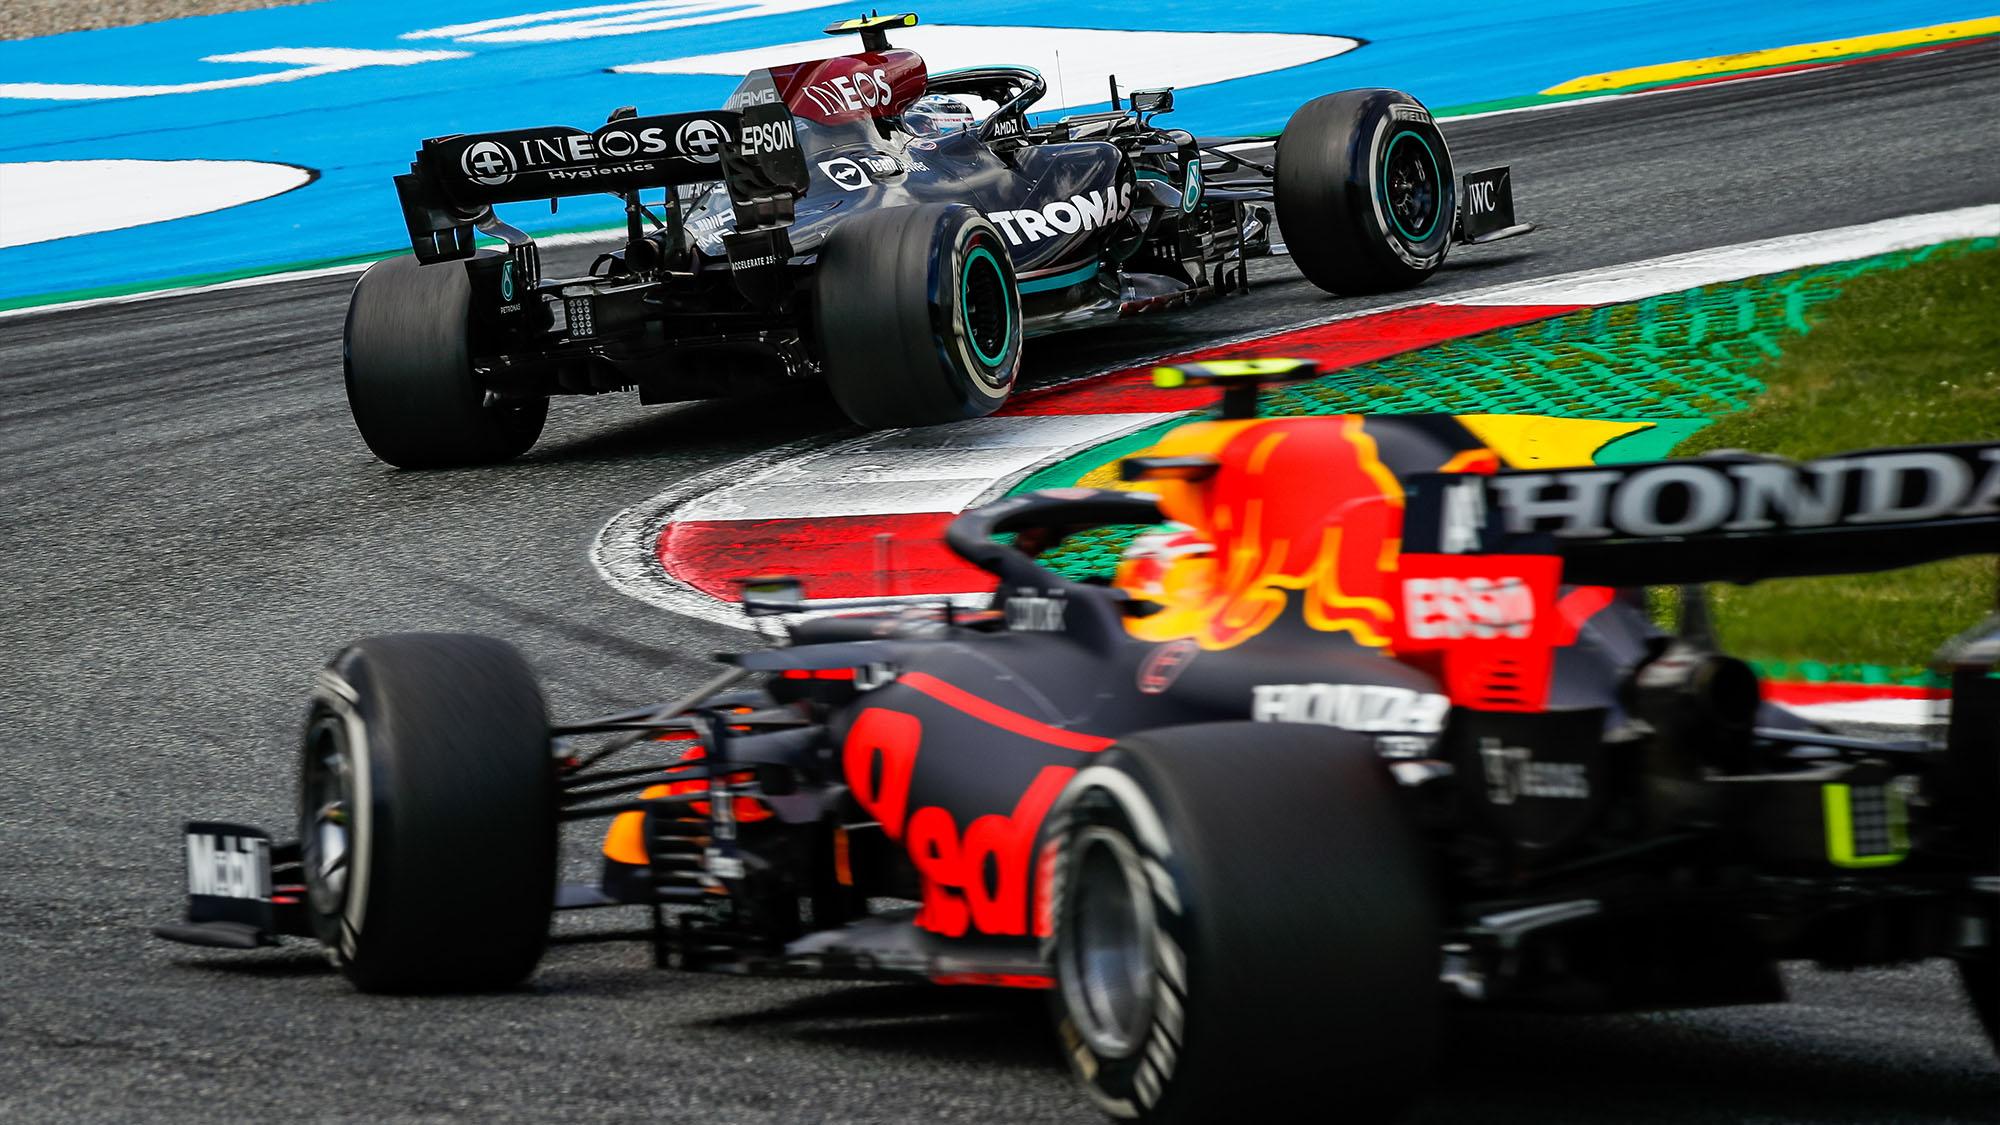 Sergio Perez chases down Valteri Bottas at the 2021 Styrian Grand Prix